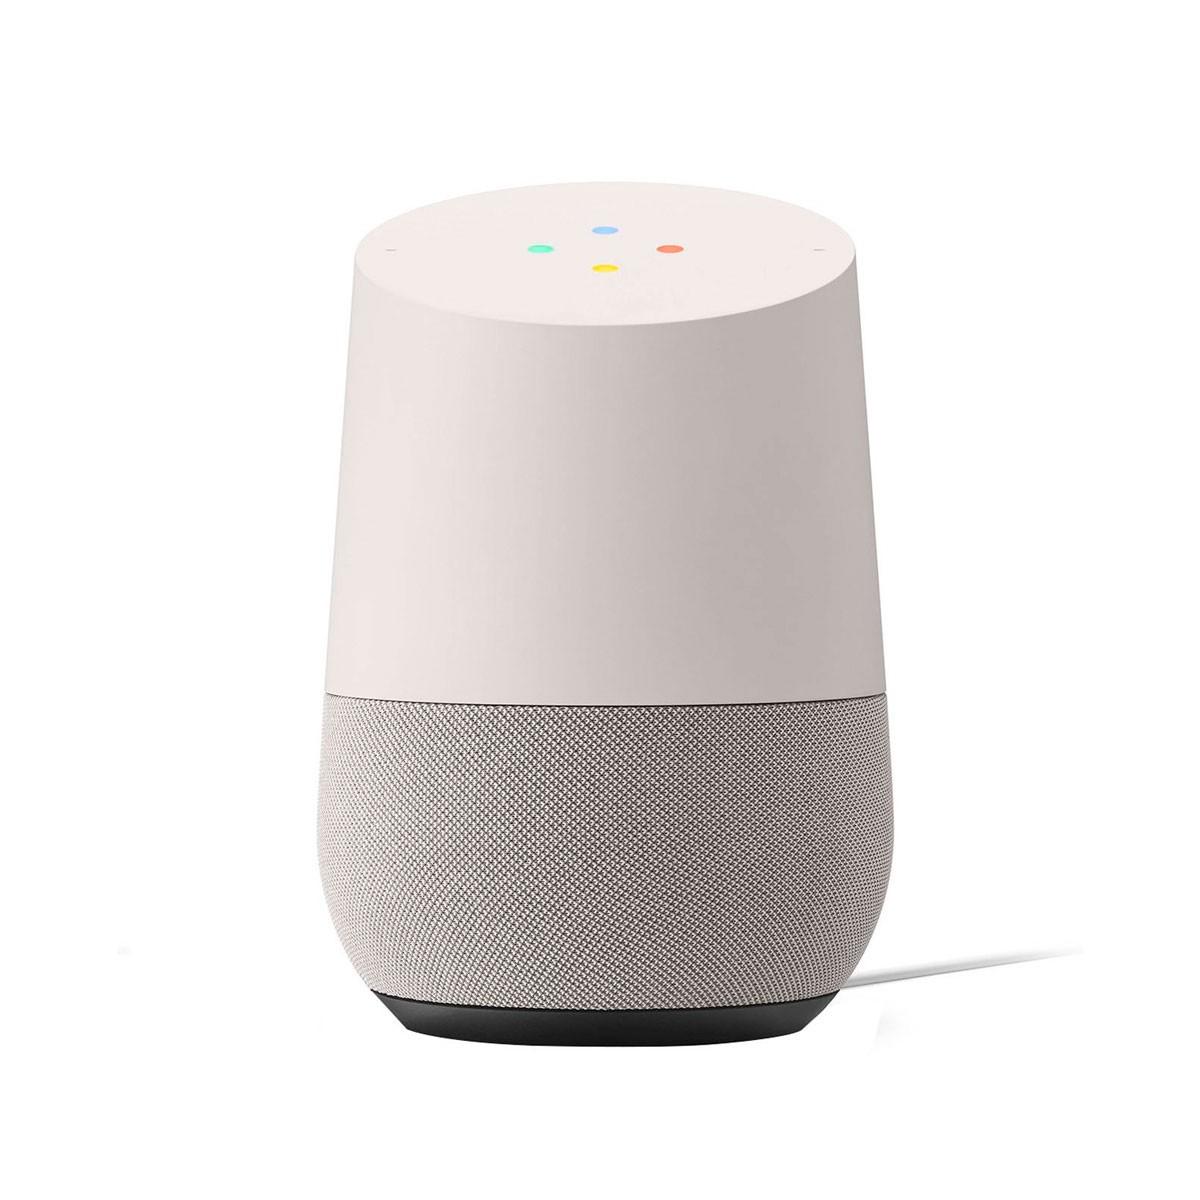 Google Home blanco